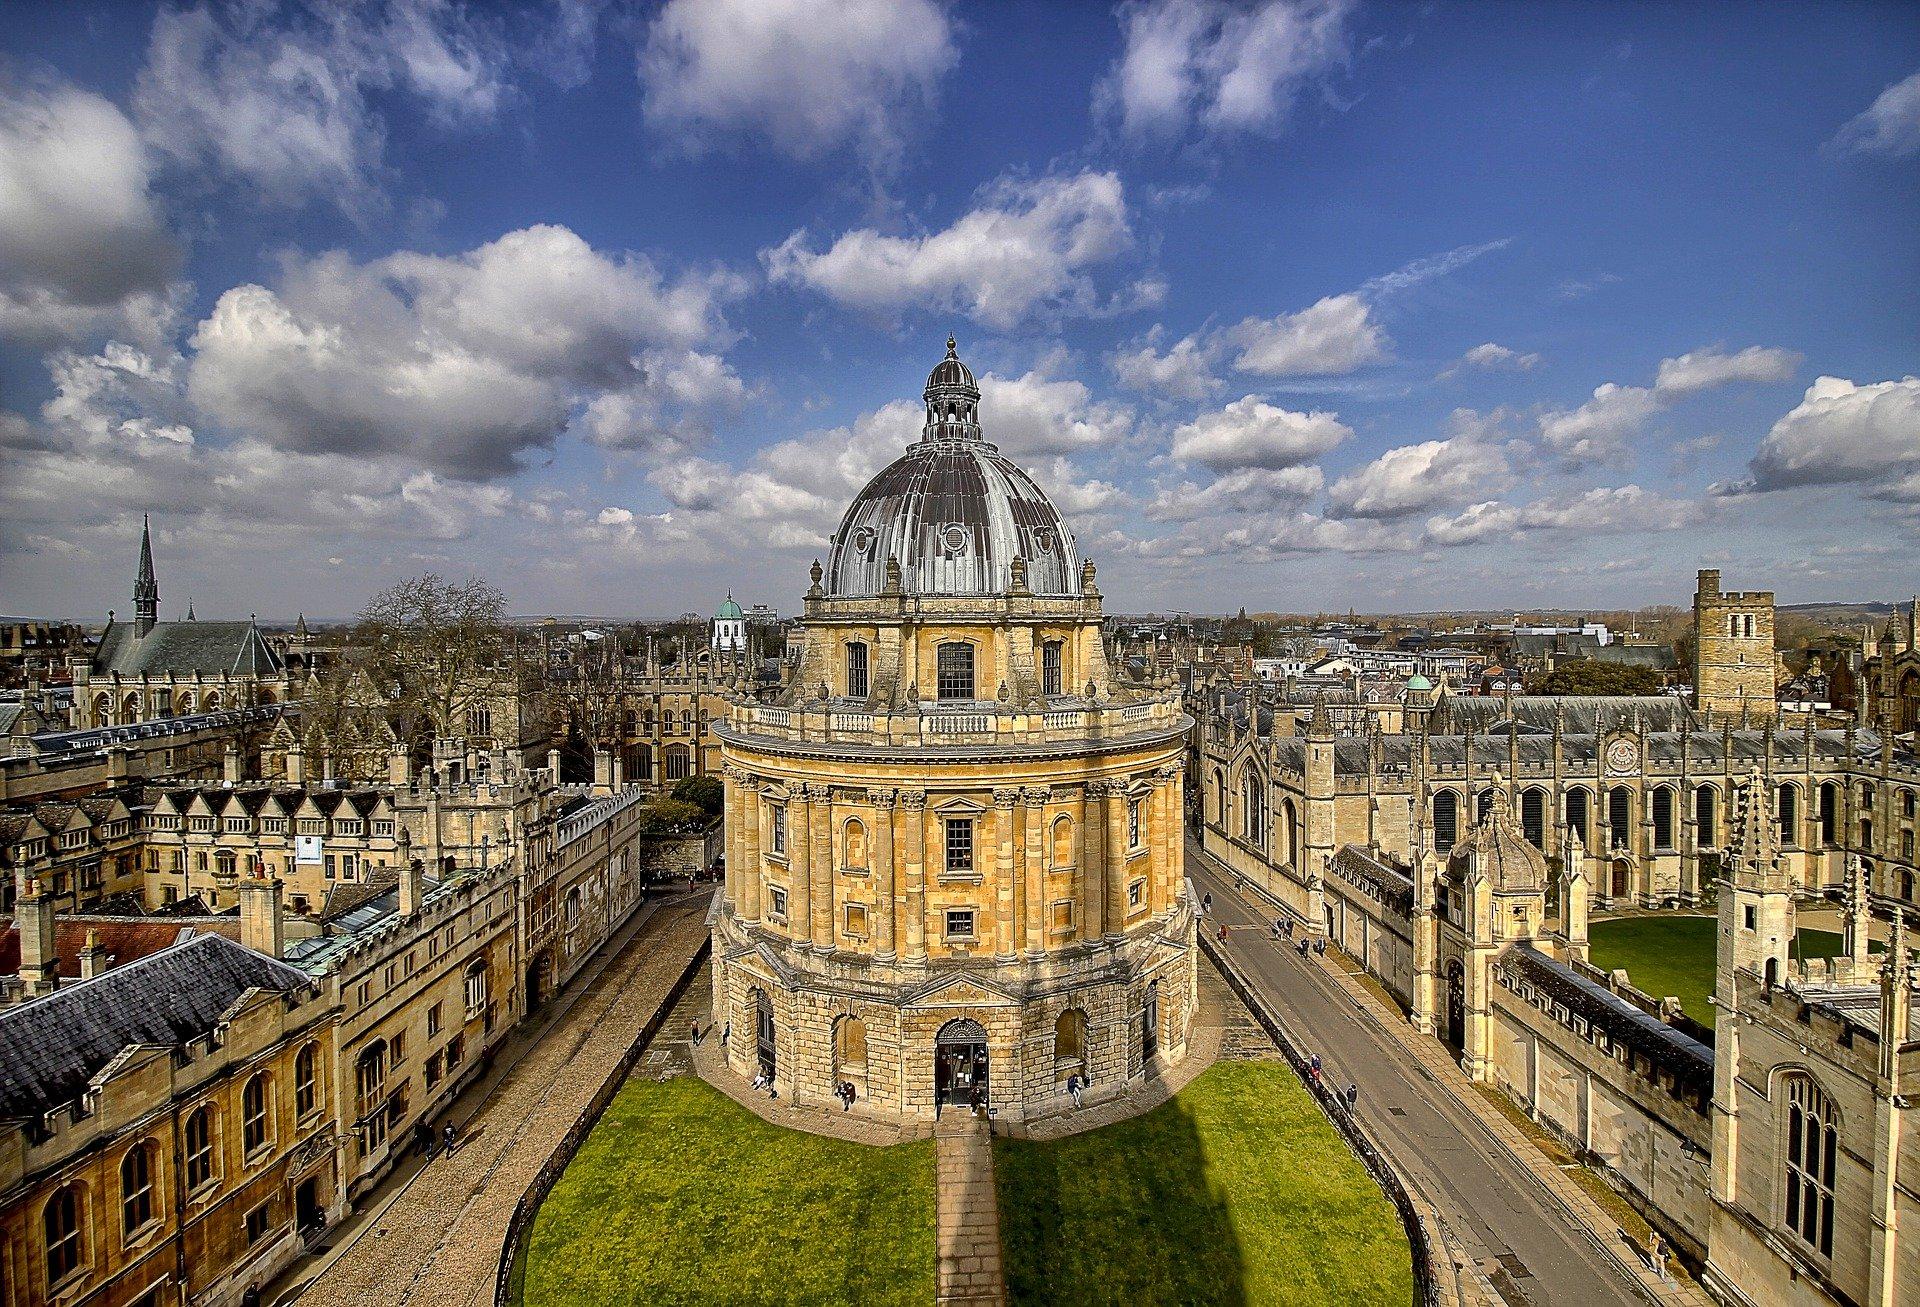 Asbestos Services Oxford, Oxfordshire